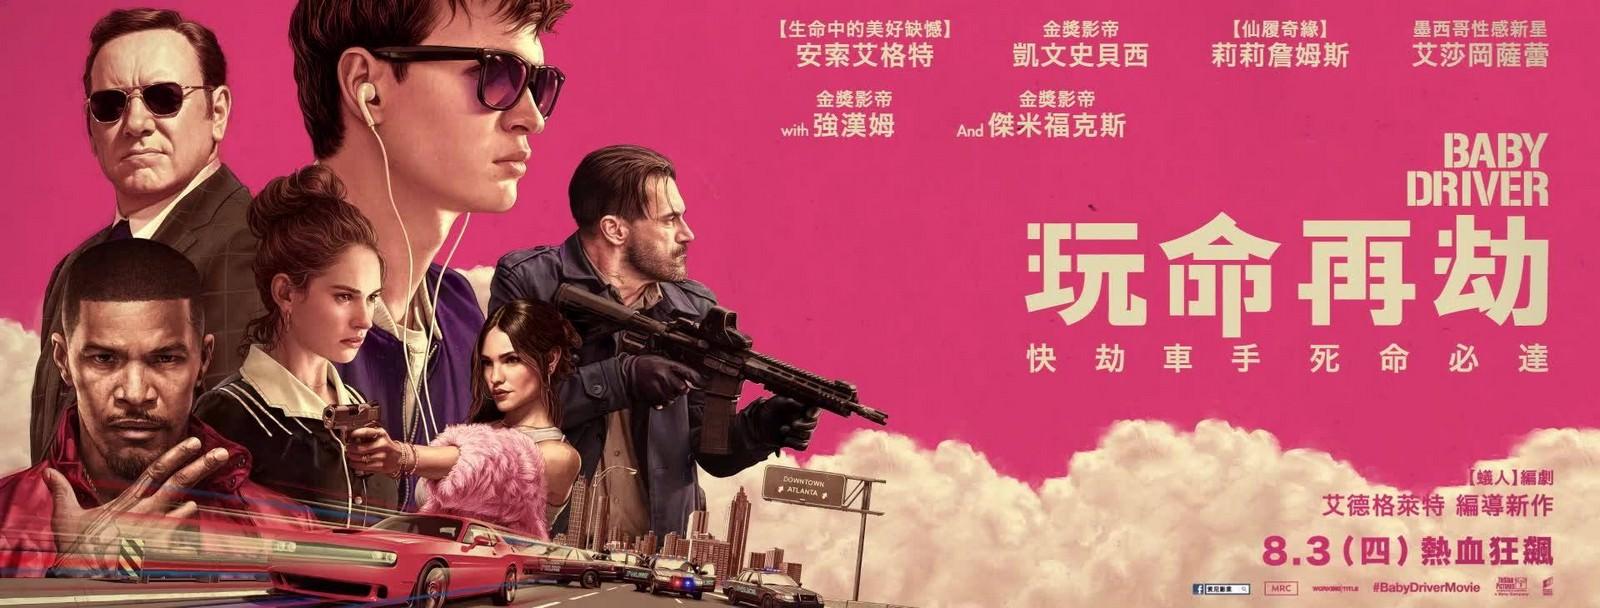 Movie, Baby Driver(美國, 2017年) / 玩命再劫(台灣) / 极盗车神(中國) / 寶貝車神(香港), 電影海報, 台灣, 橫版